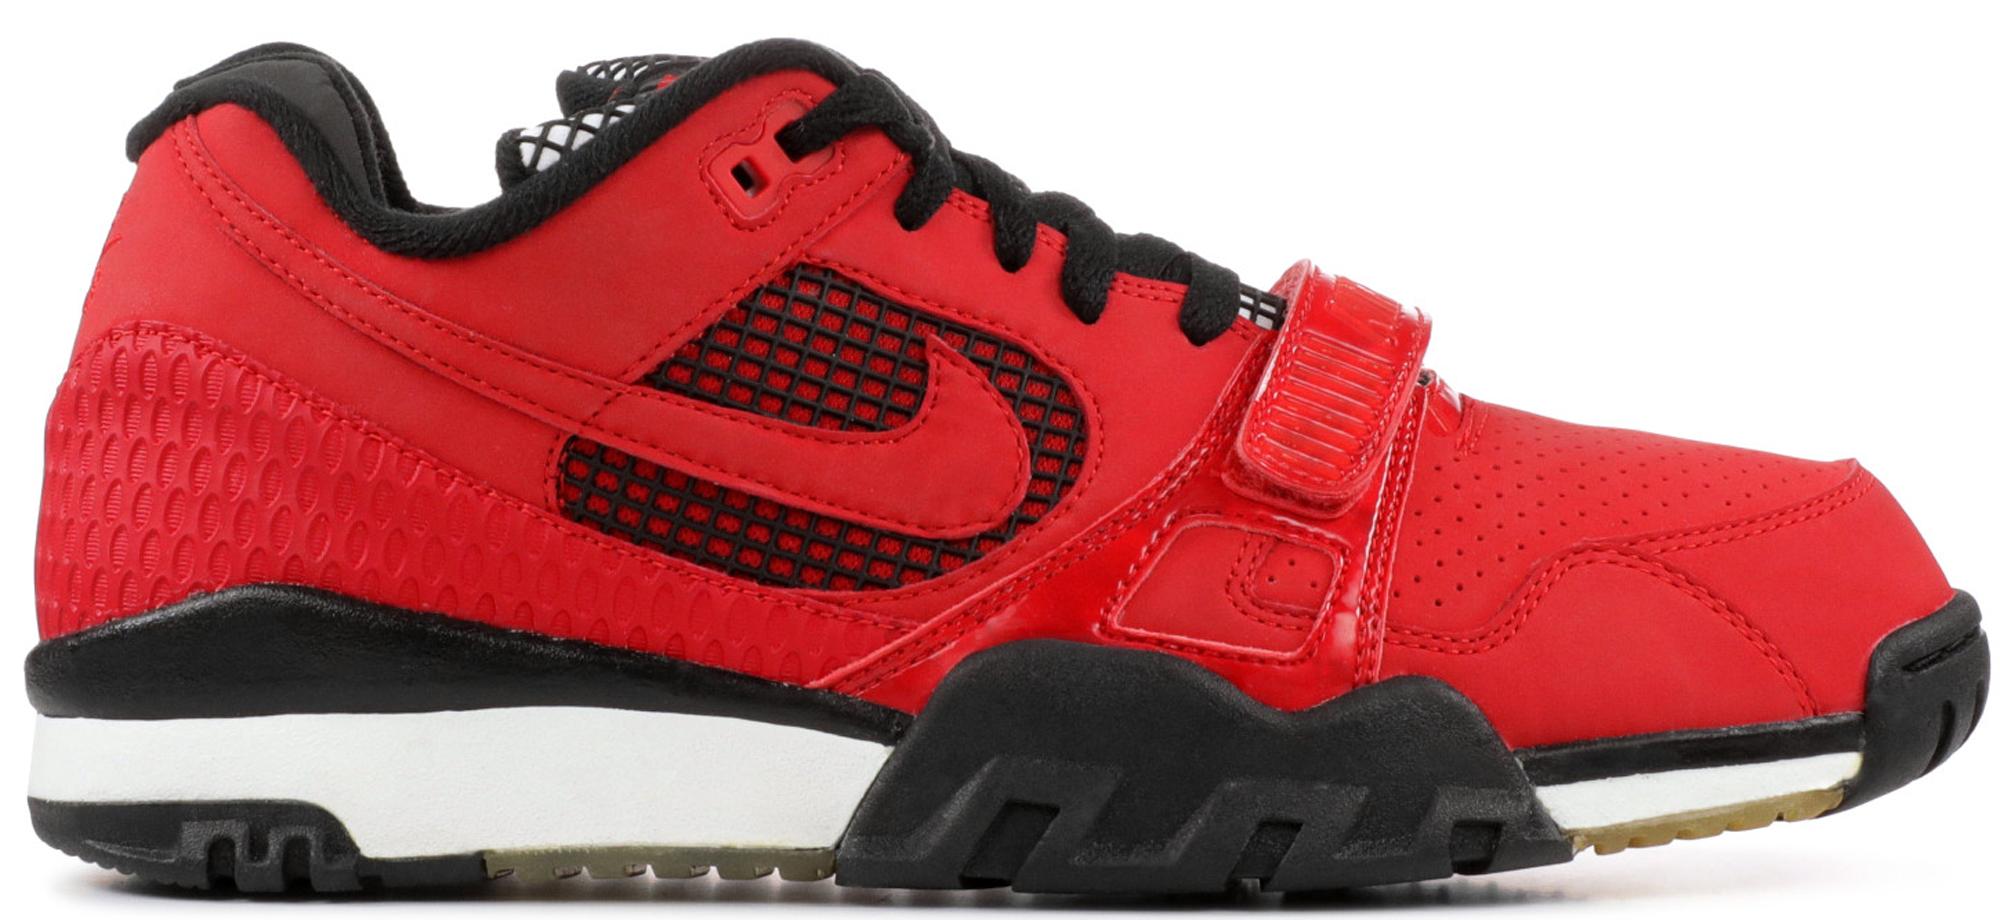 Nike SB Air Trainer 2 Supreme Red